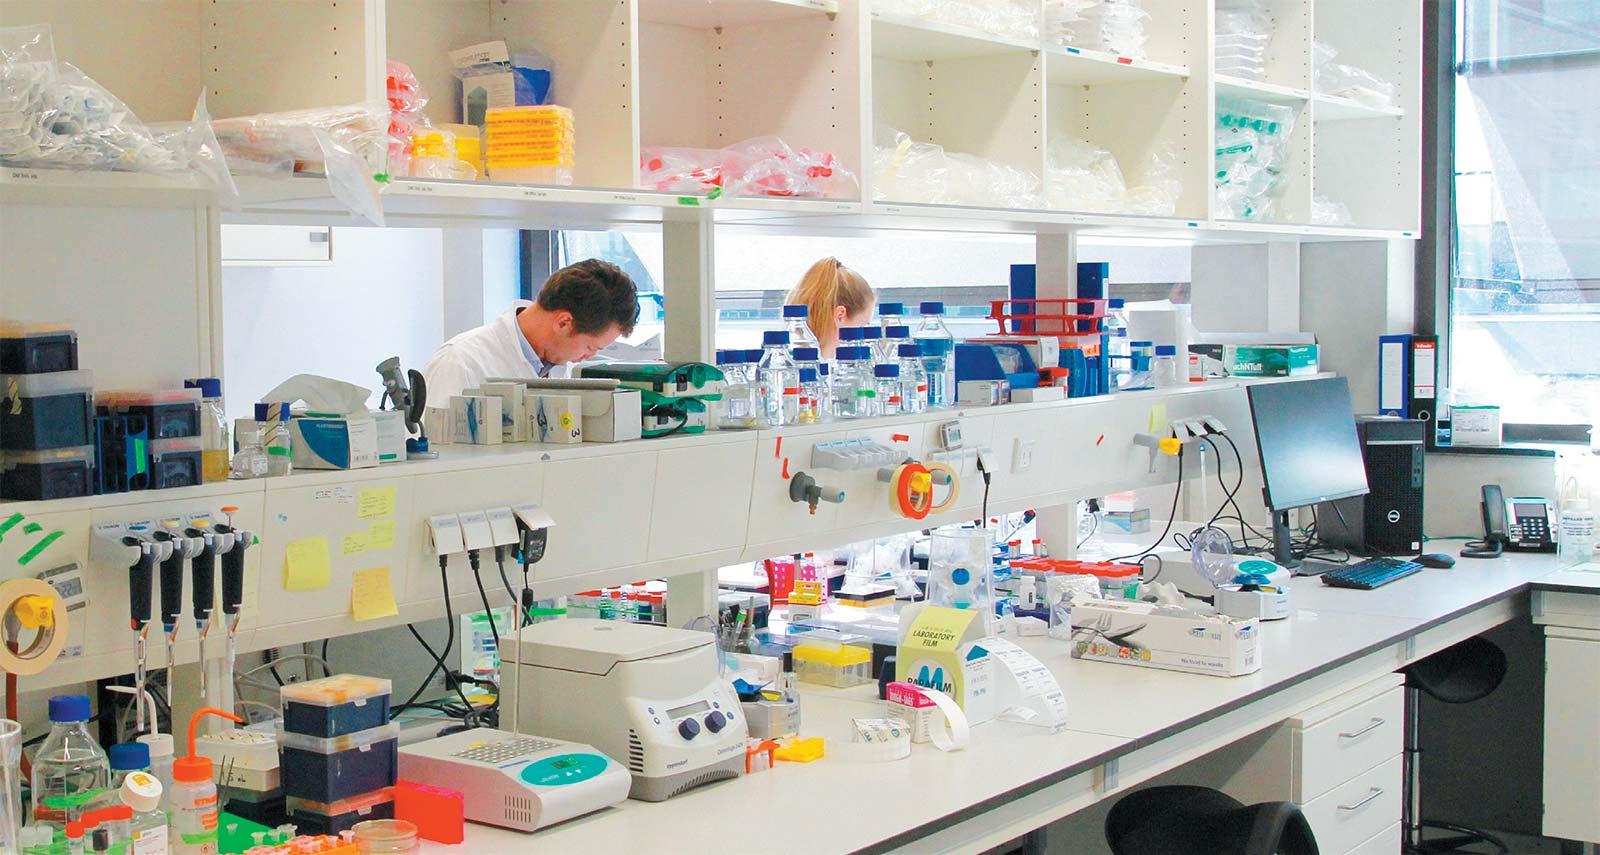 laboratoria van Bionanoscience